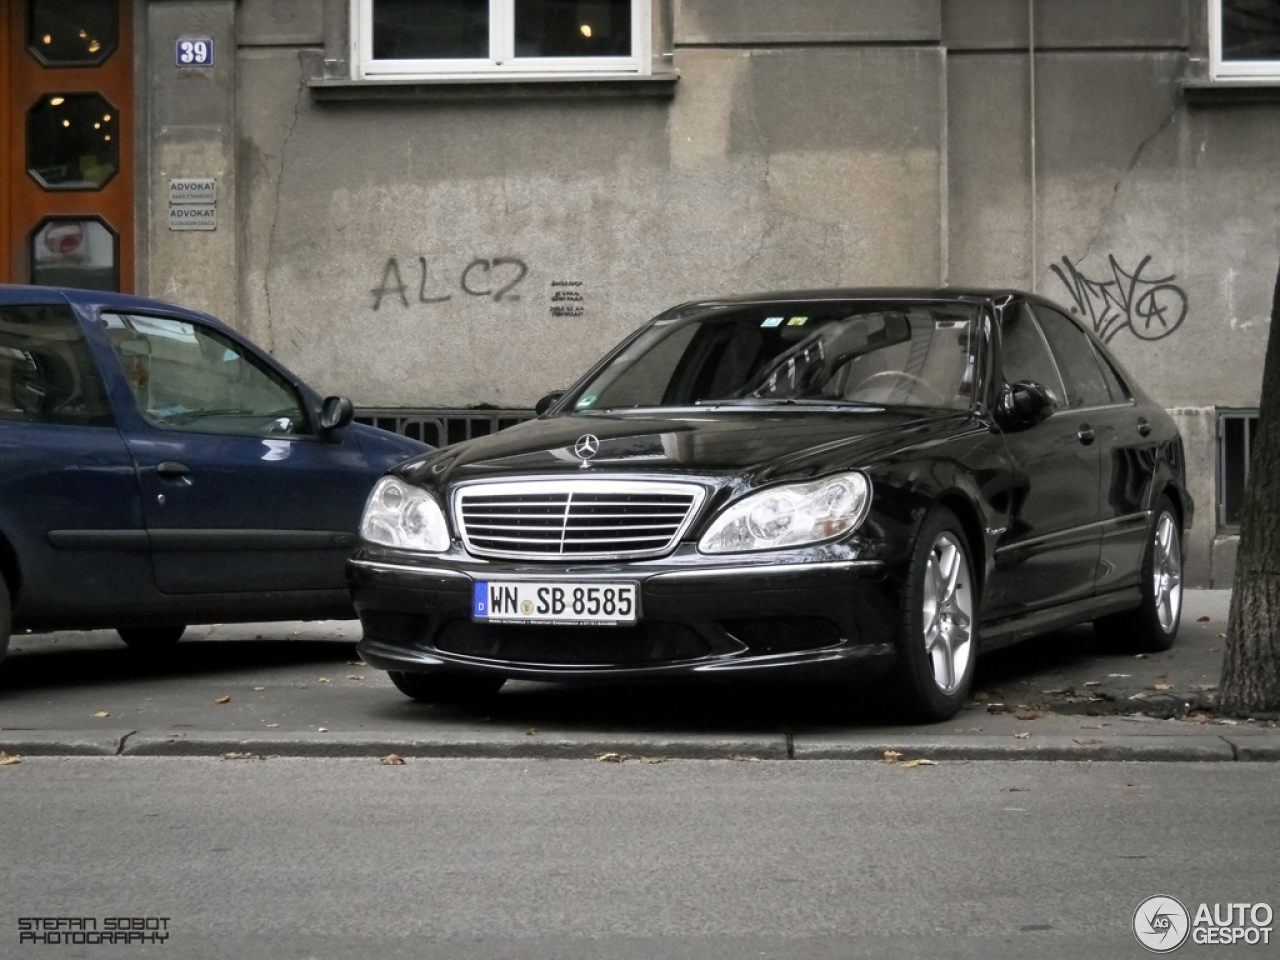 Mercedes benz s 55 amg w220 kompressor 29 november 2012 for Mercedes benz s 55